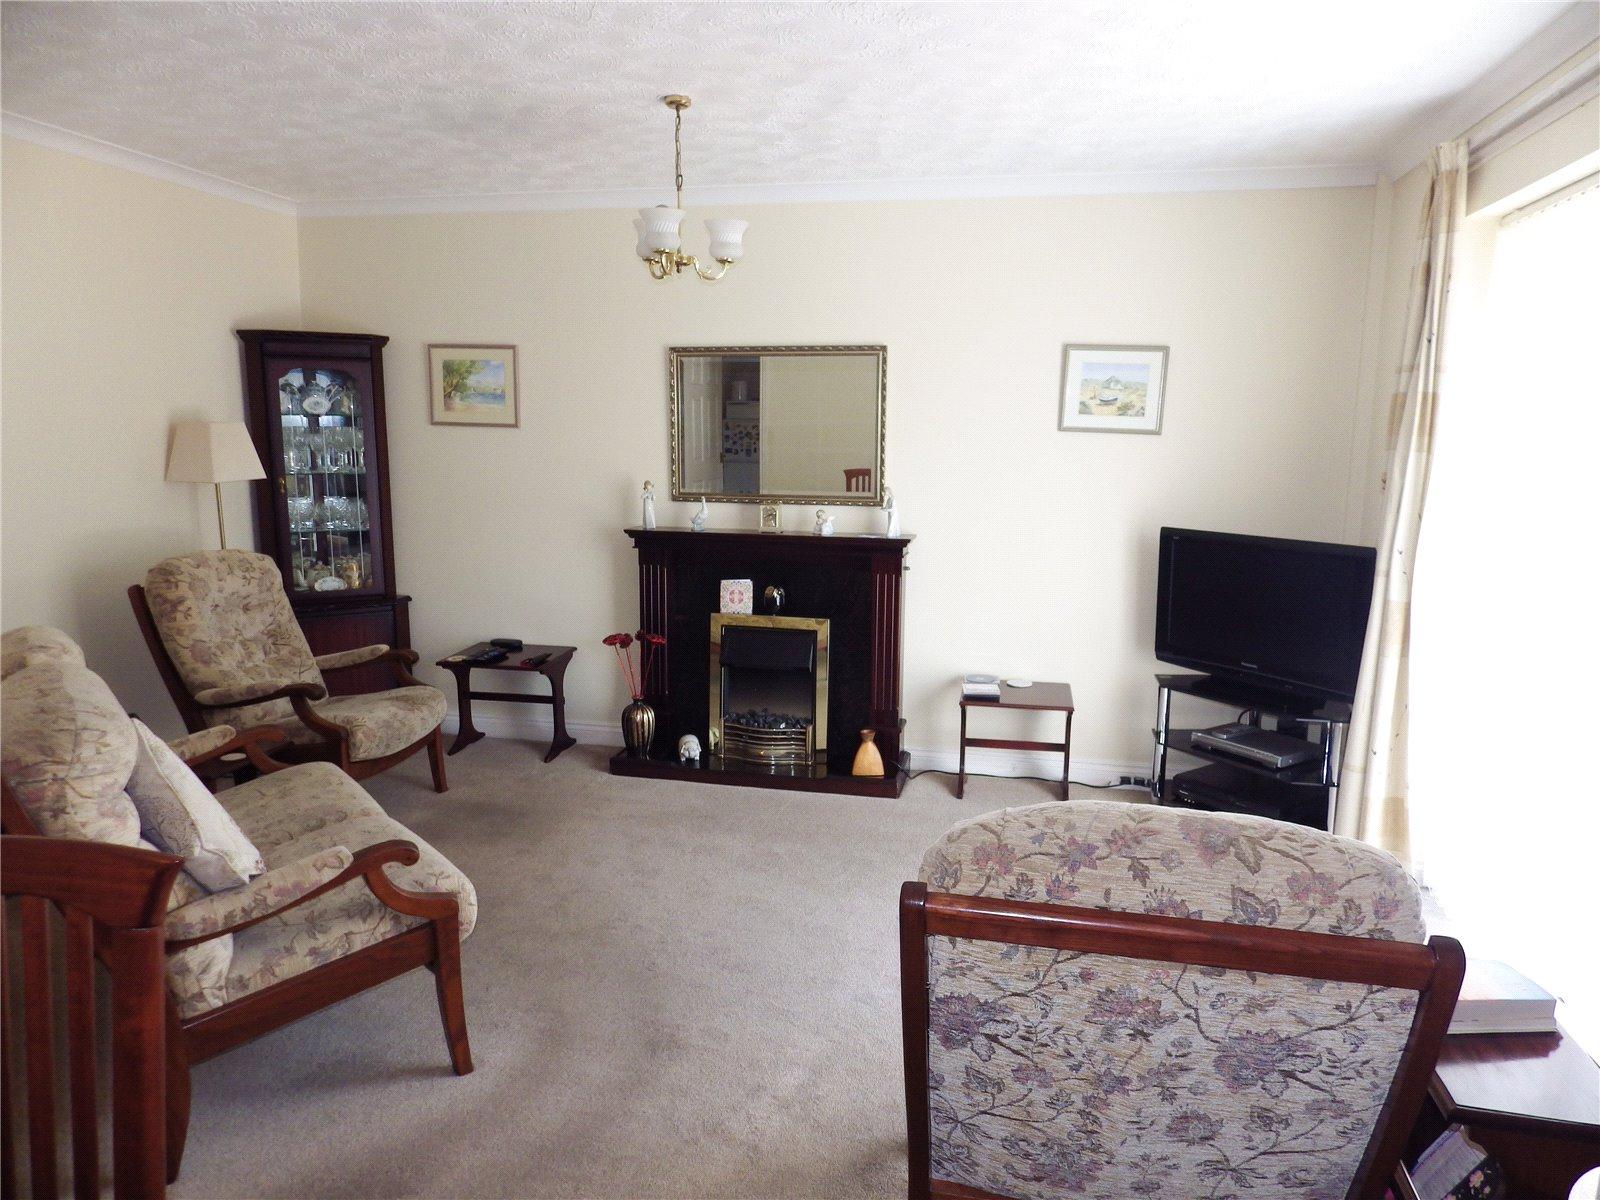 Property details | 2 BedroomFlat | Charlestown Court, Turner